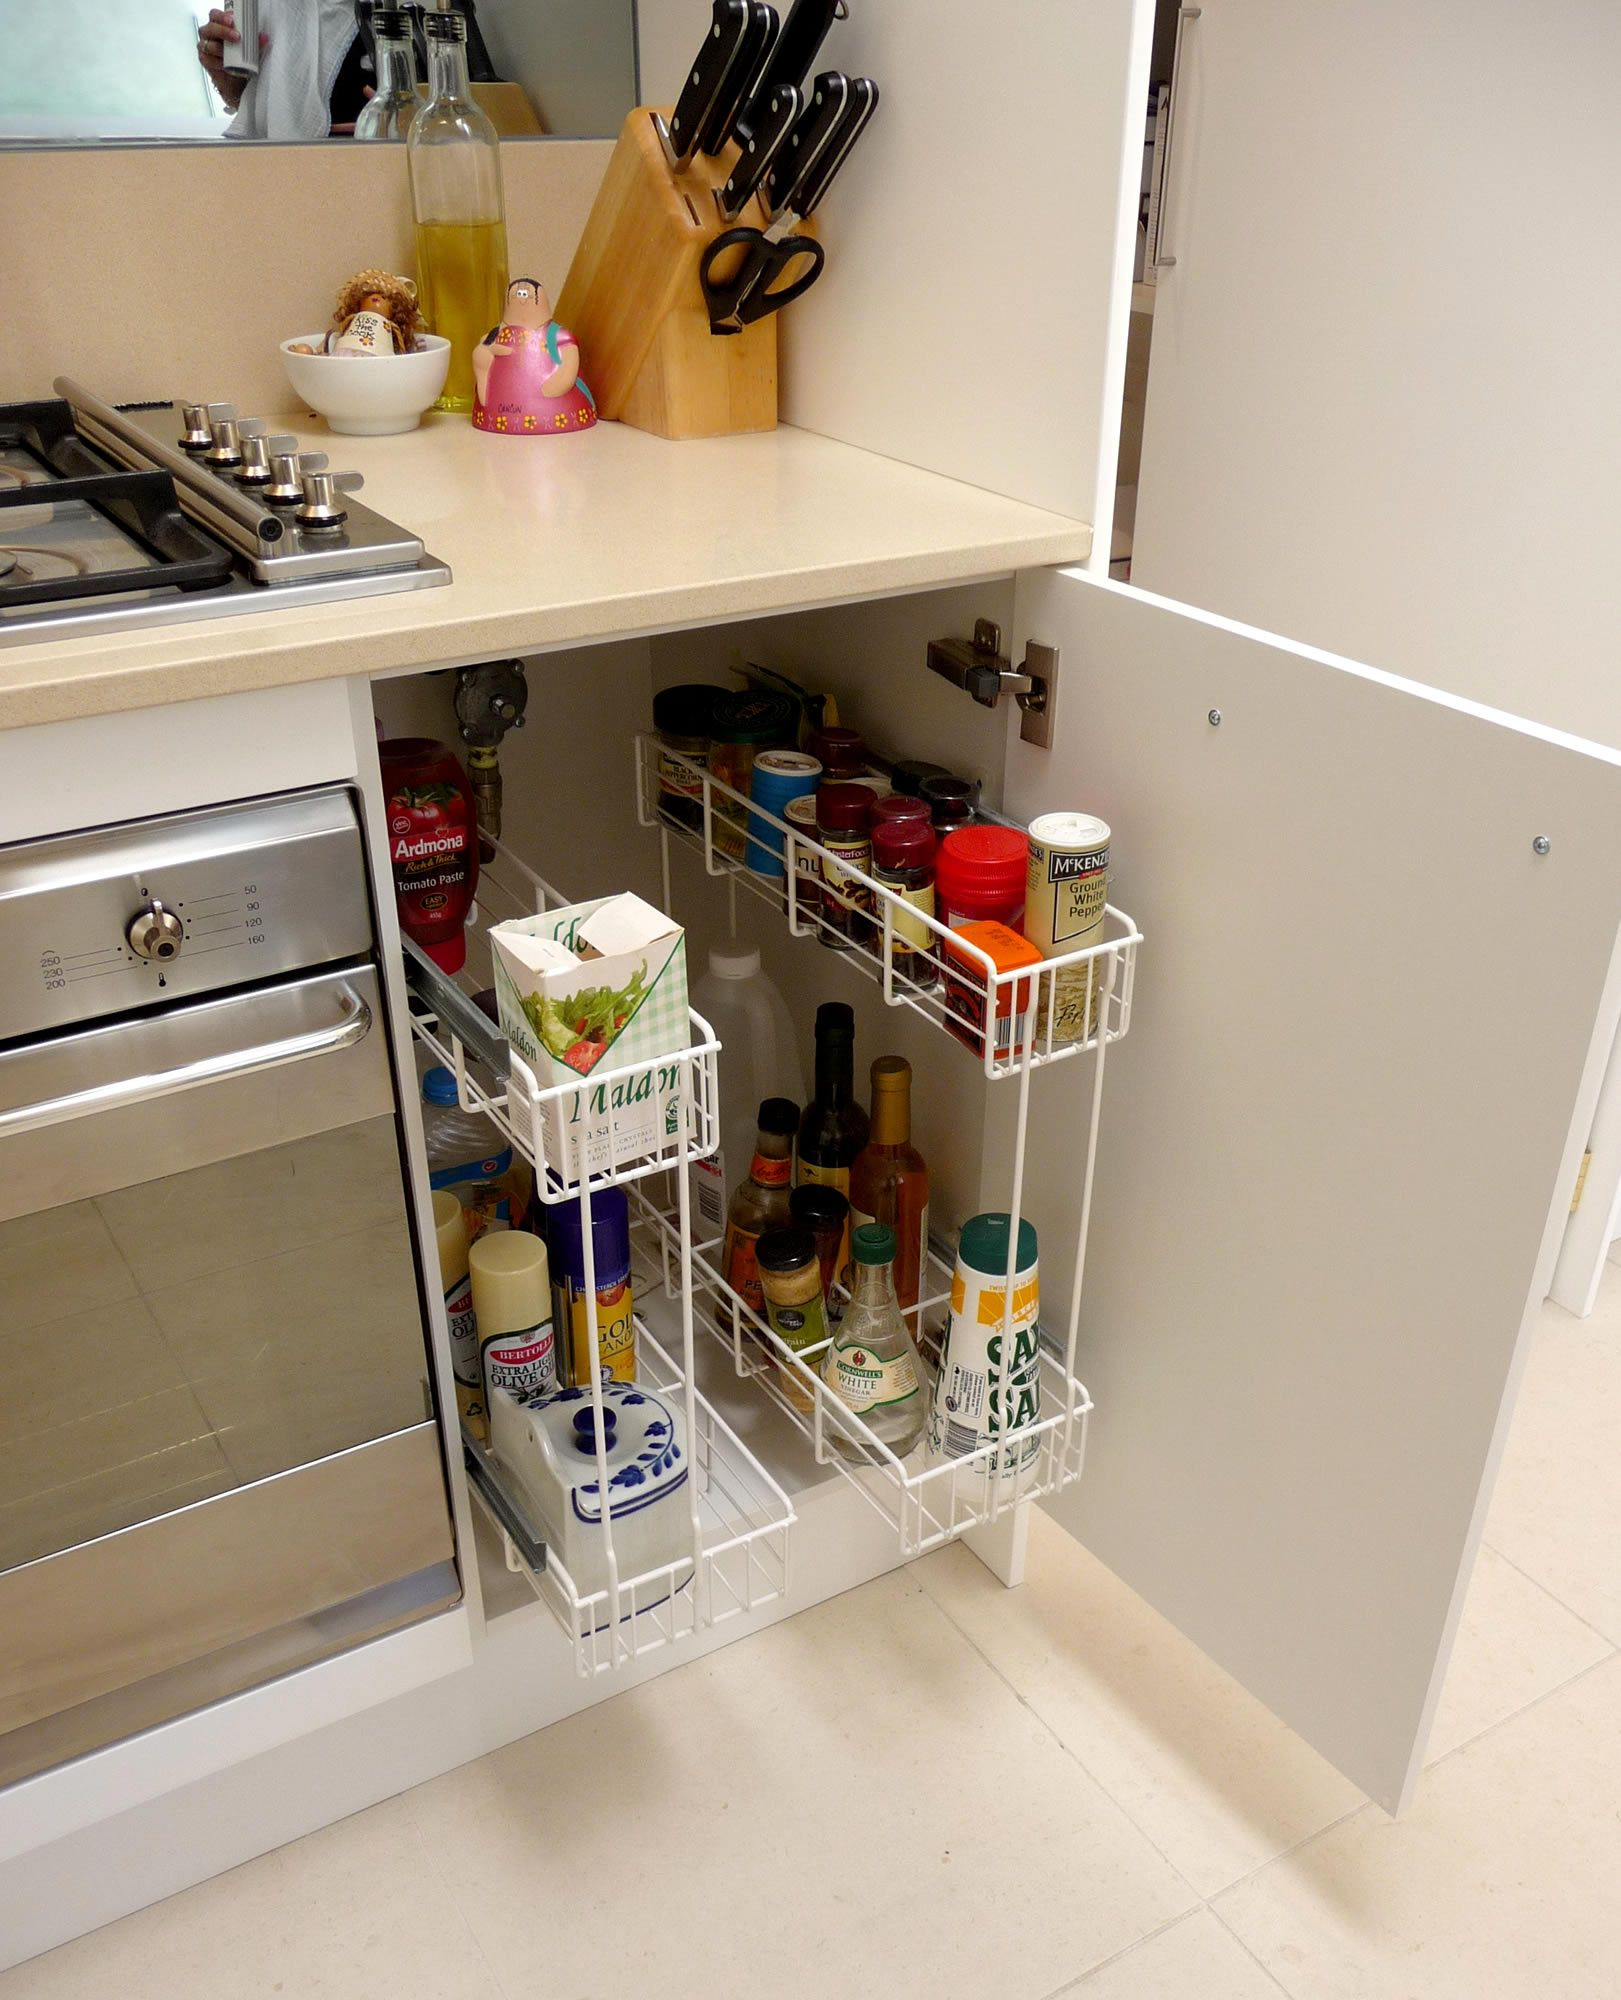 find this pin and more on kitchen storage - Kitchen Counter Storage Ideas